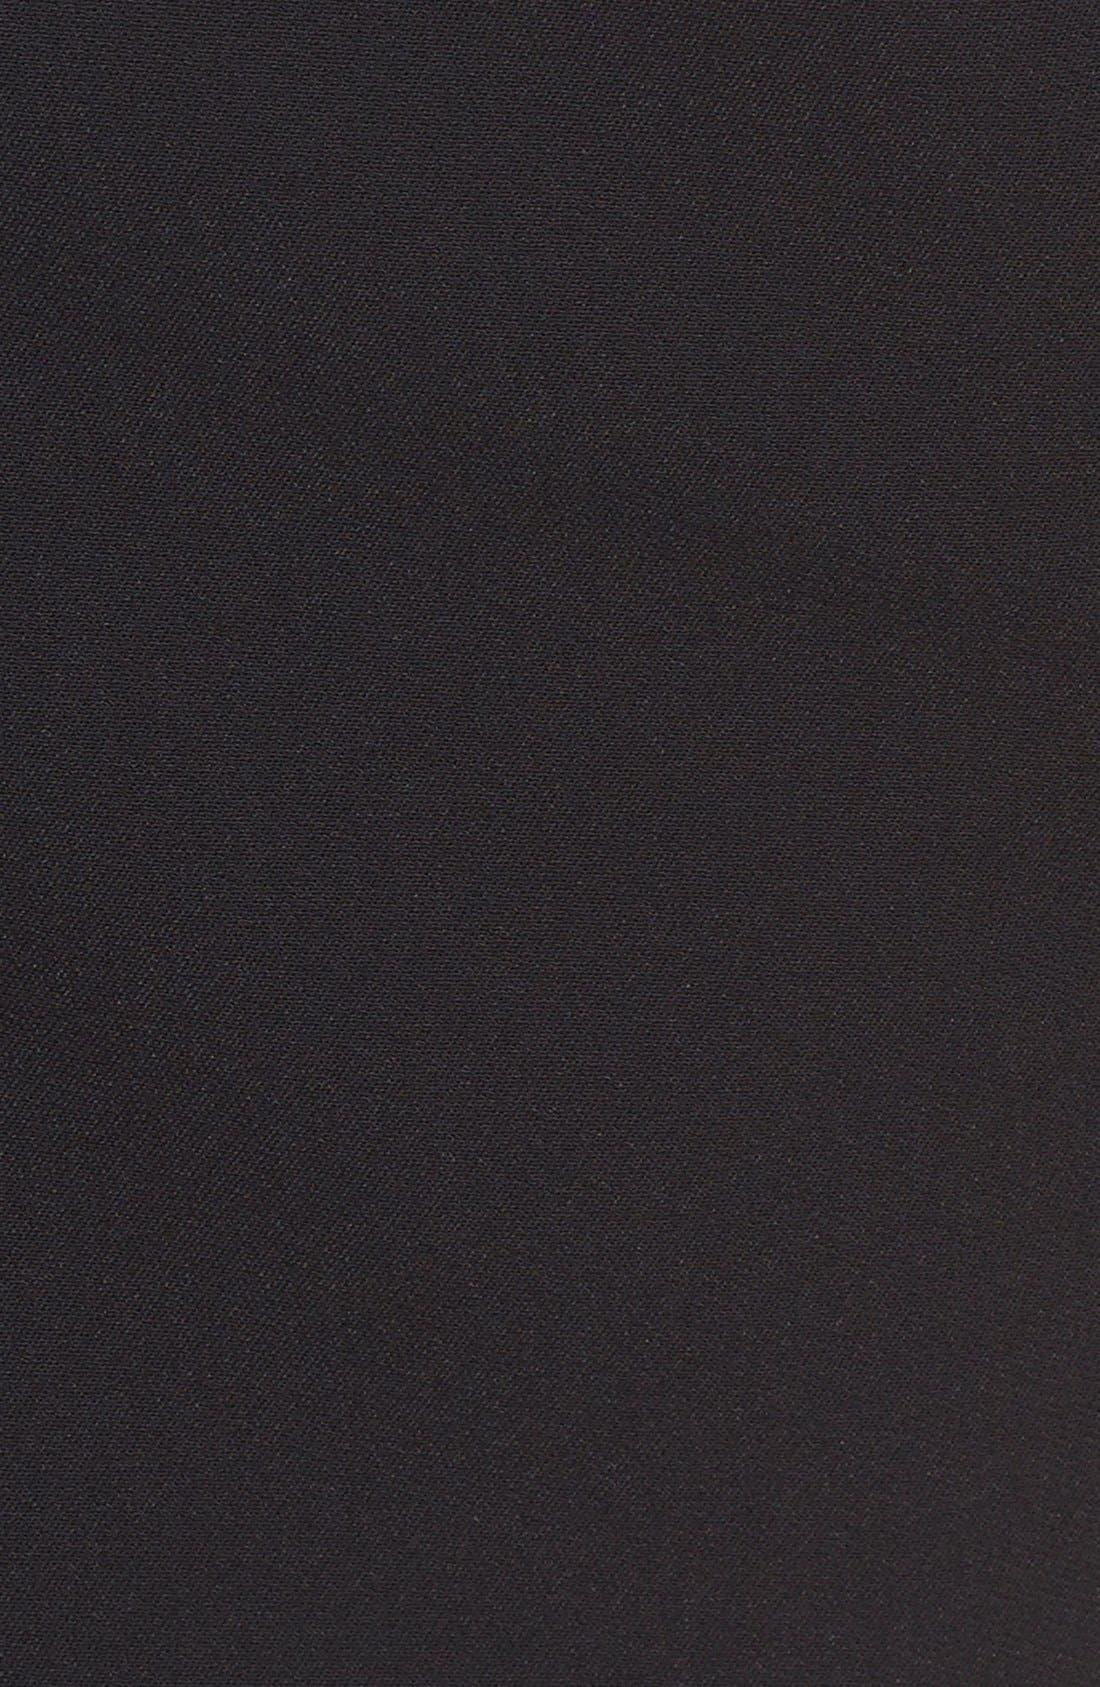 Alternate Image 3  - Stella McCartney 'Shiloh' One-Shoulder Column Gown